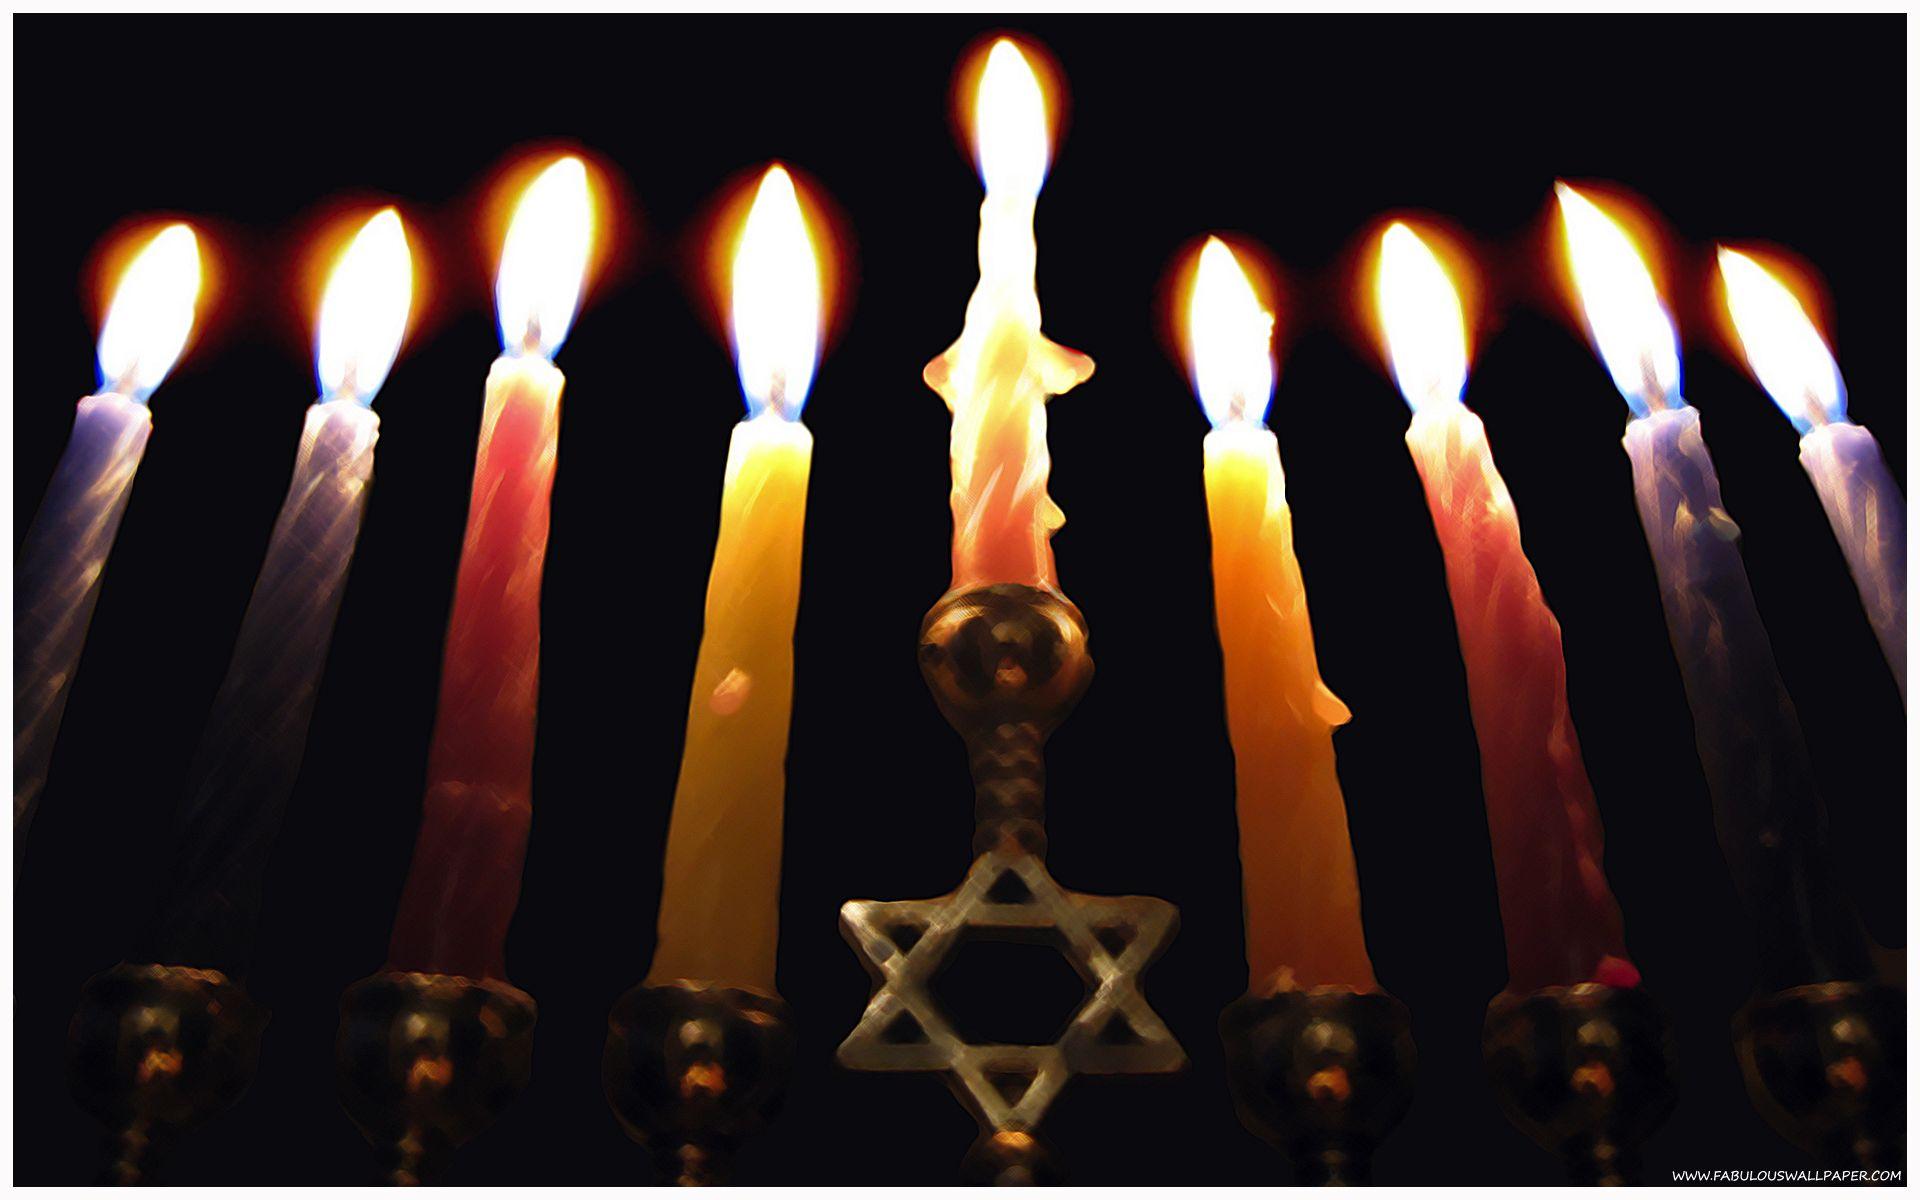 Hanukkah Background Google Search Candles Wallpaper Birthday Candles Free Birthday Stuff